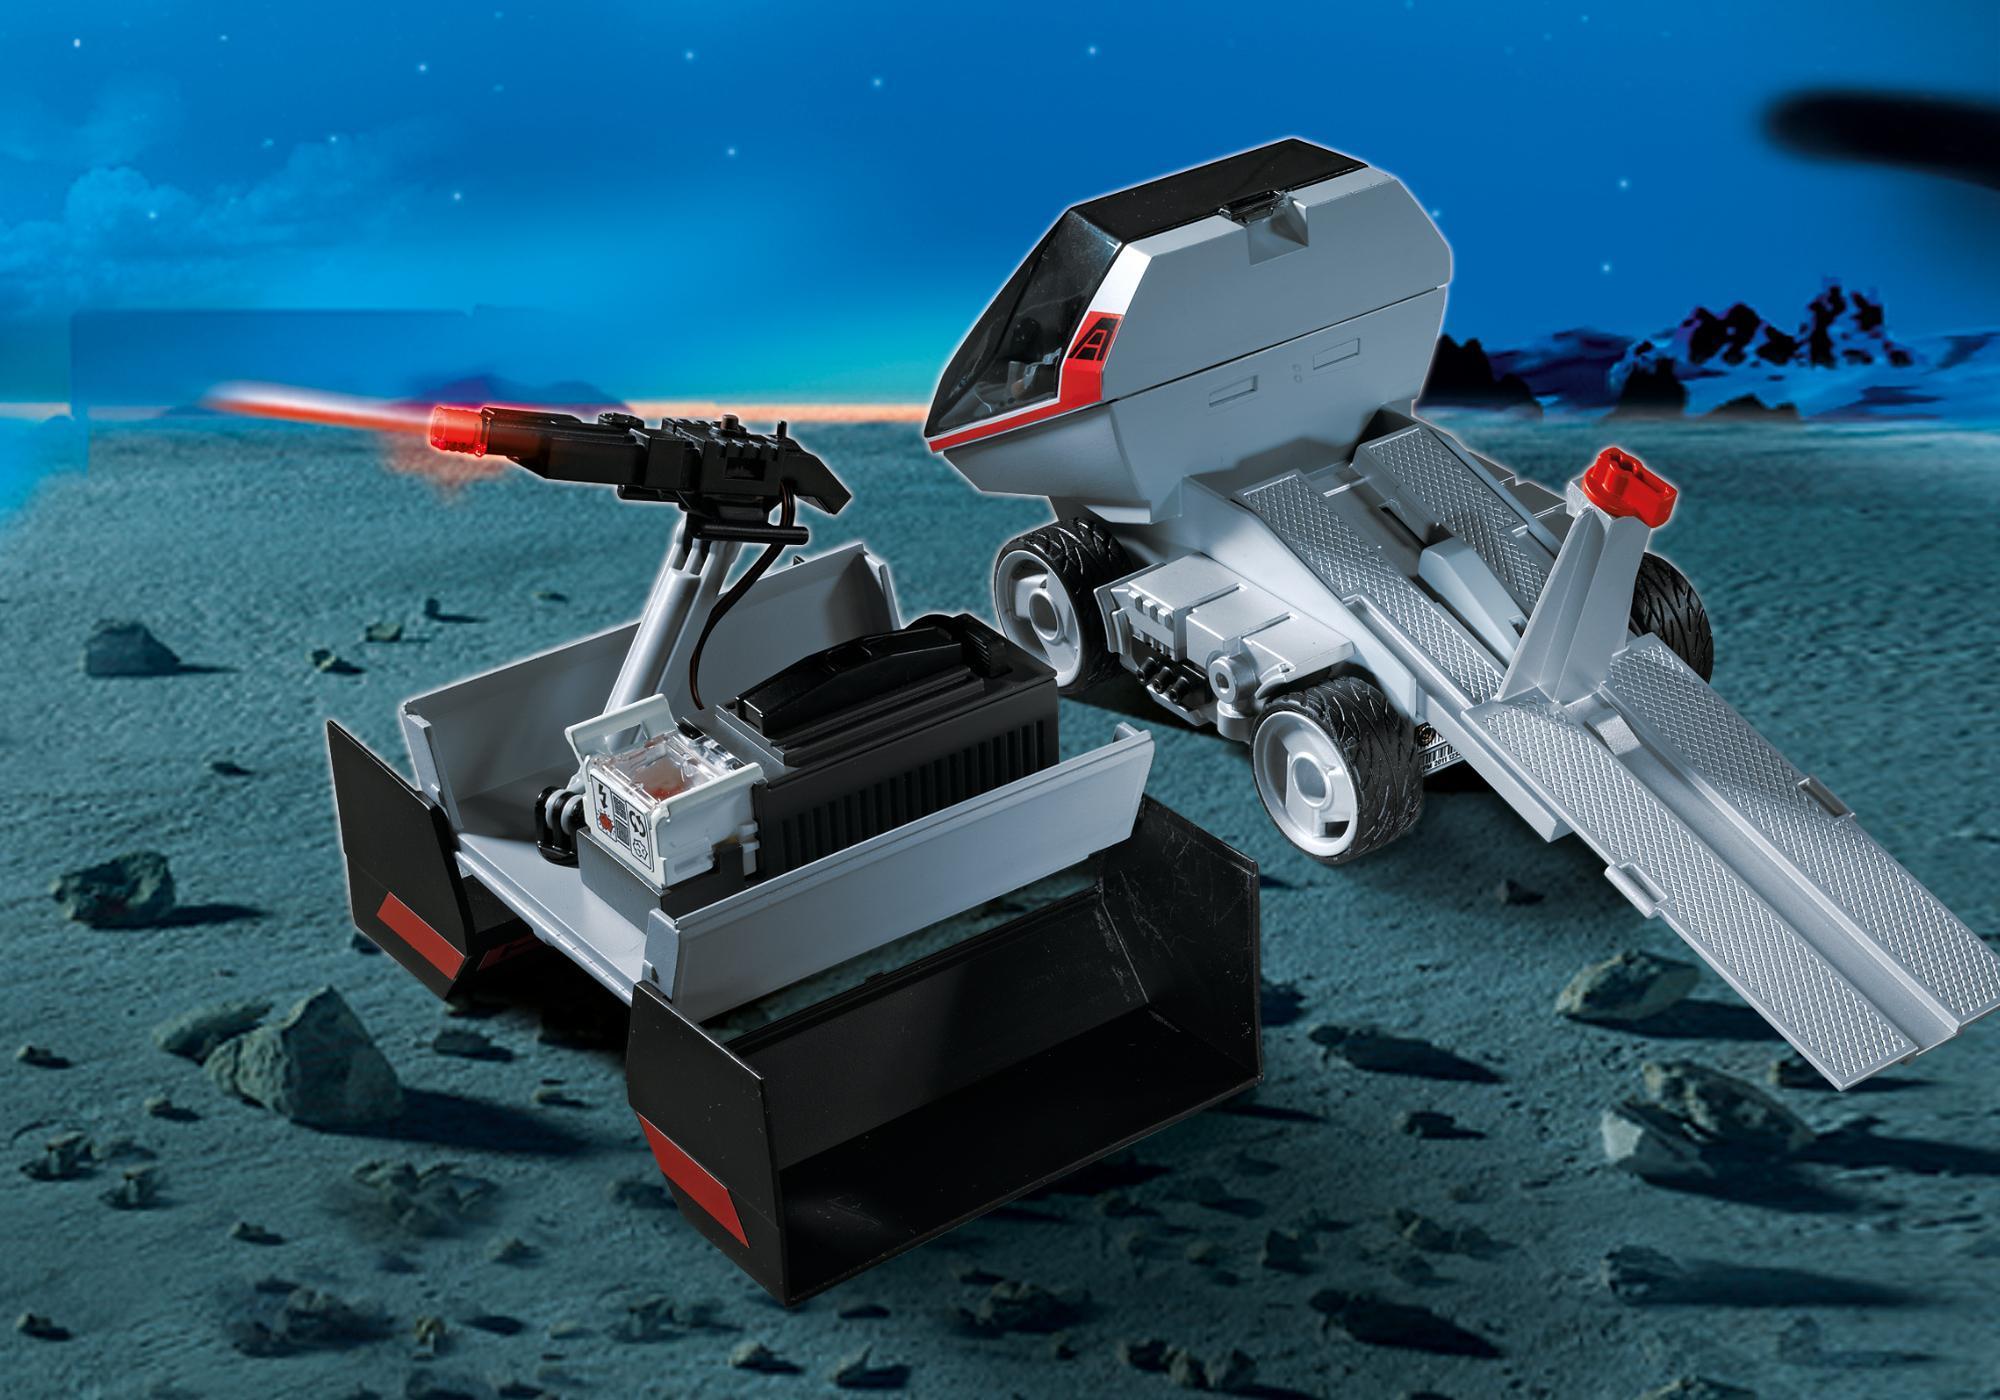 http://media.playmobil.com/i/playmobil/5154_product_extra3/Darksters Truck mit K.O.-Leuchtkanone